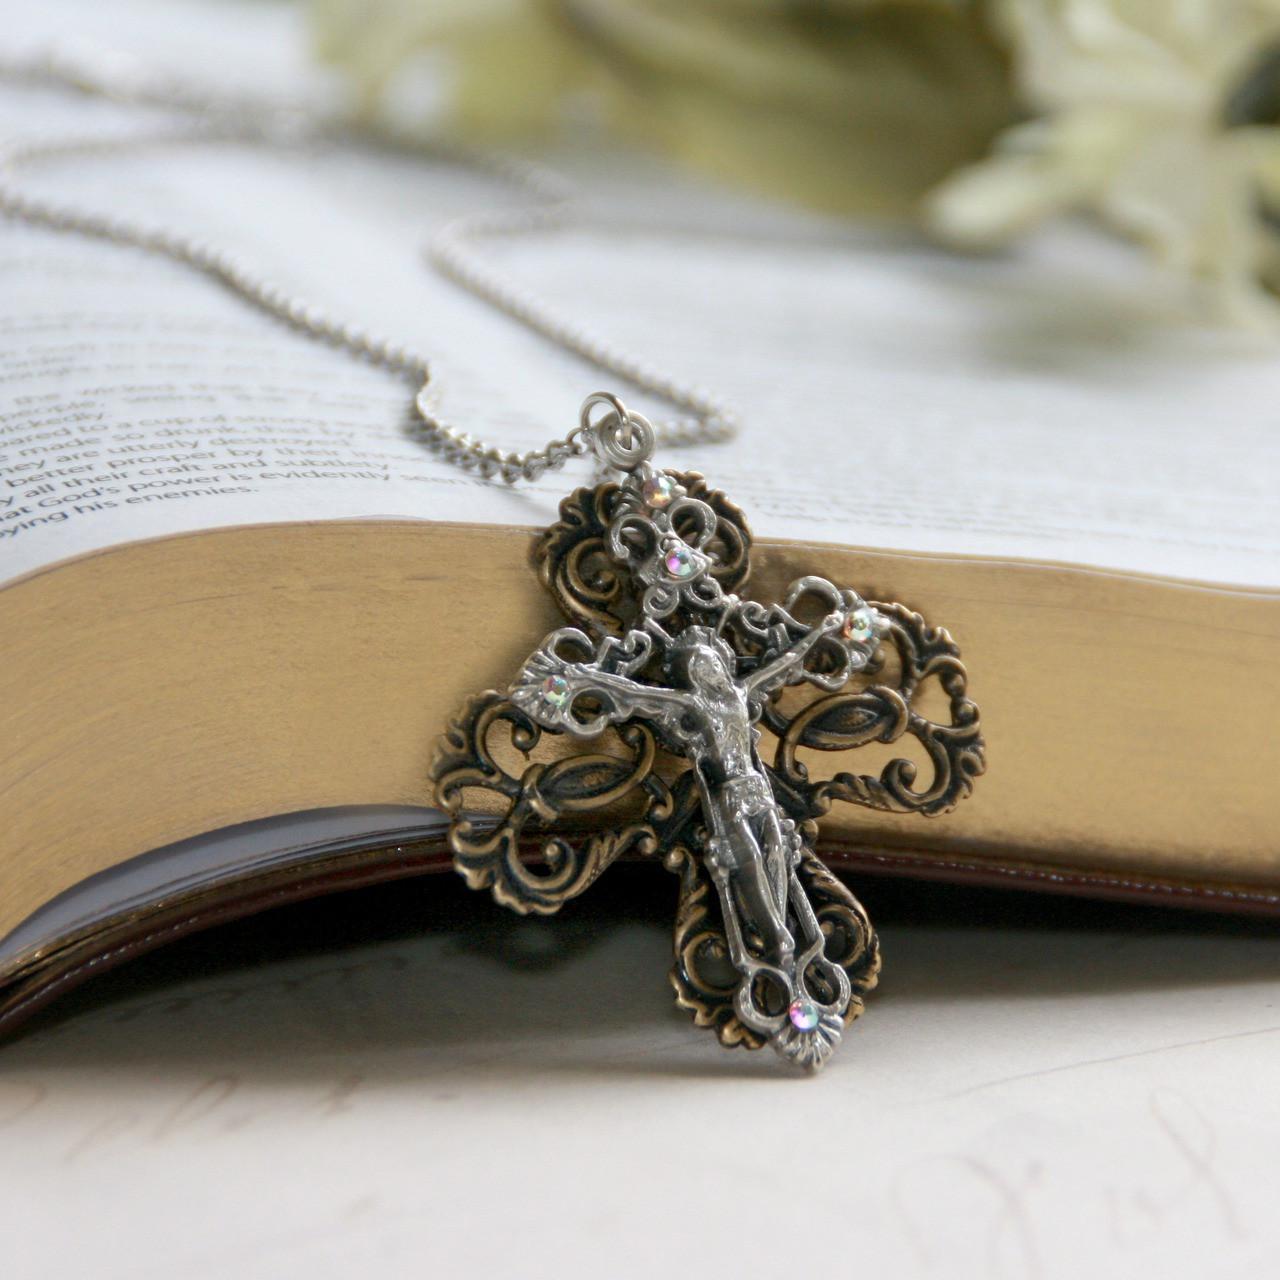 IN-549  Crucifix Filagree Pendant Necklace